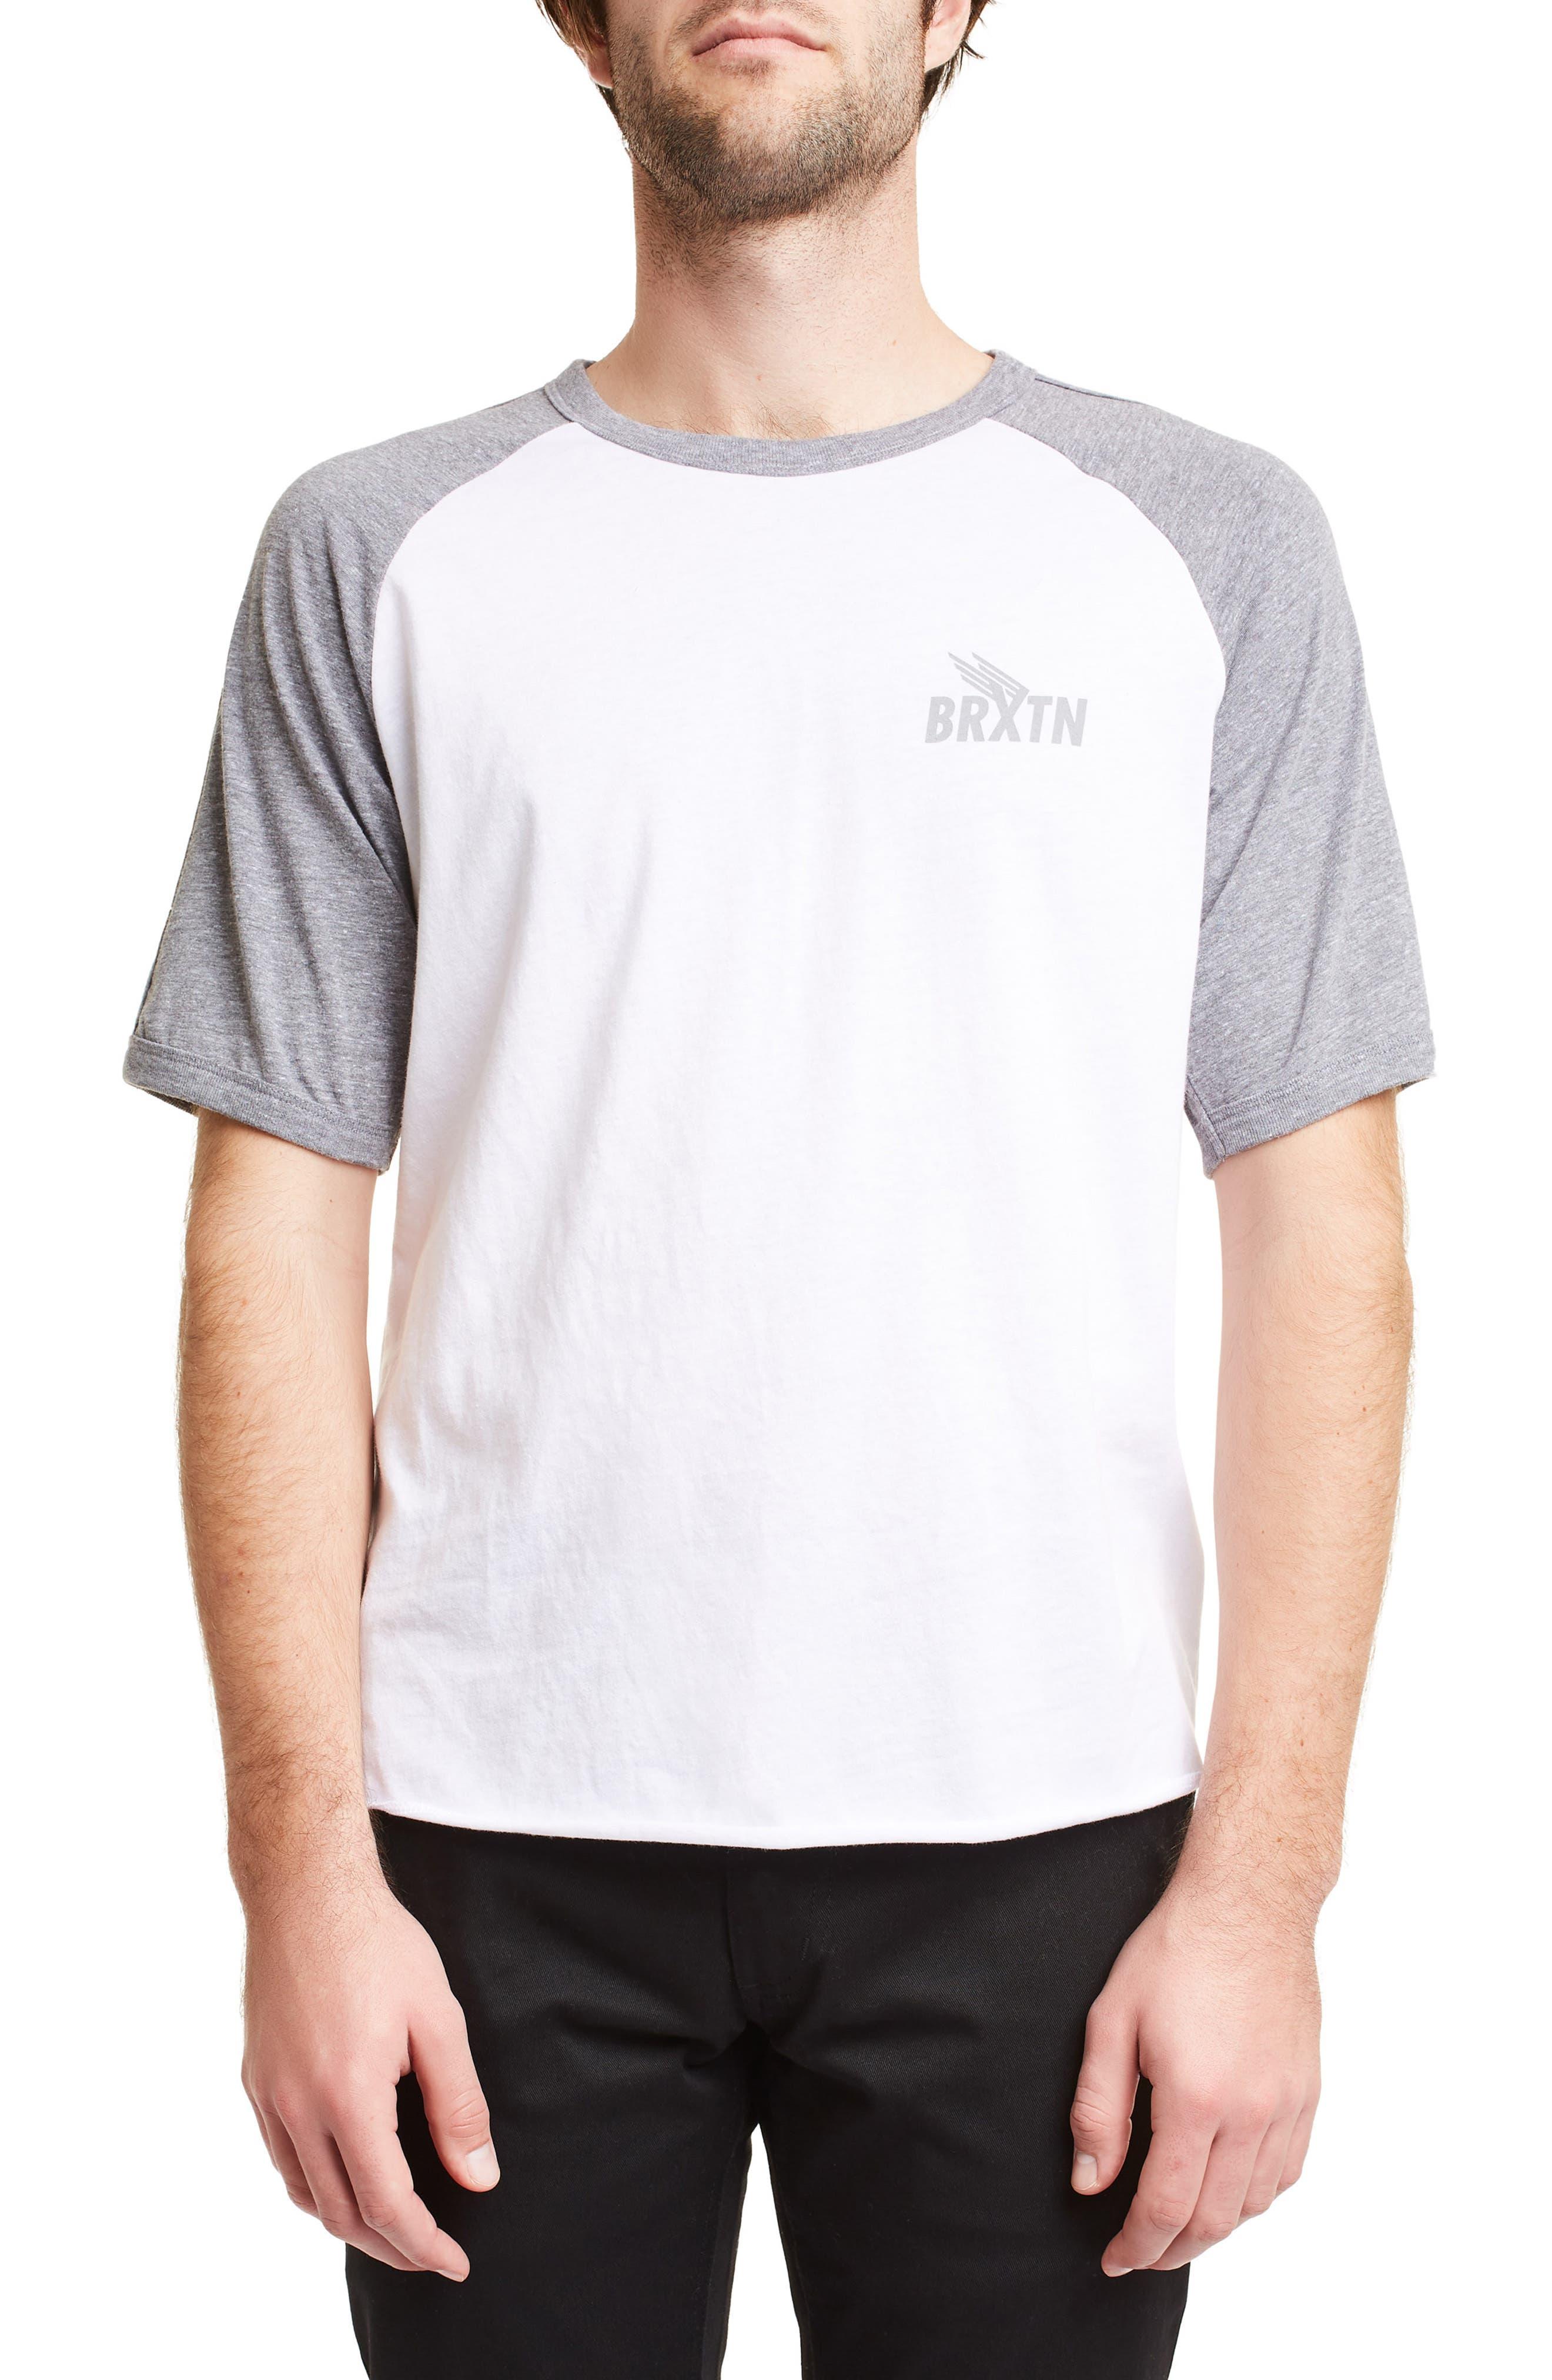 Brixton Rogers Ii Raglan T-Shirt, White